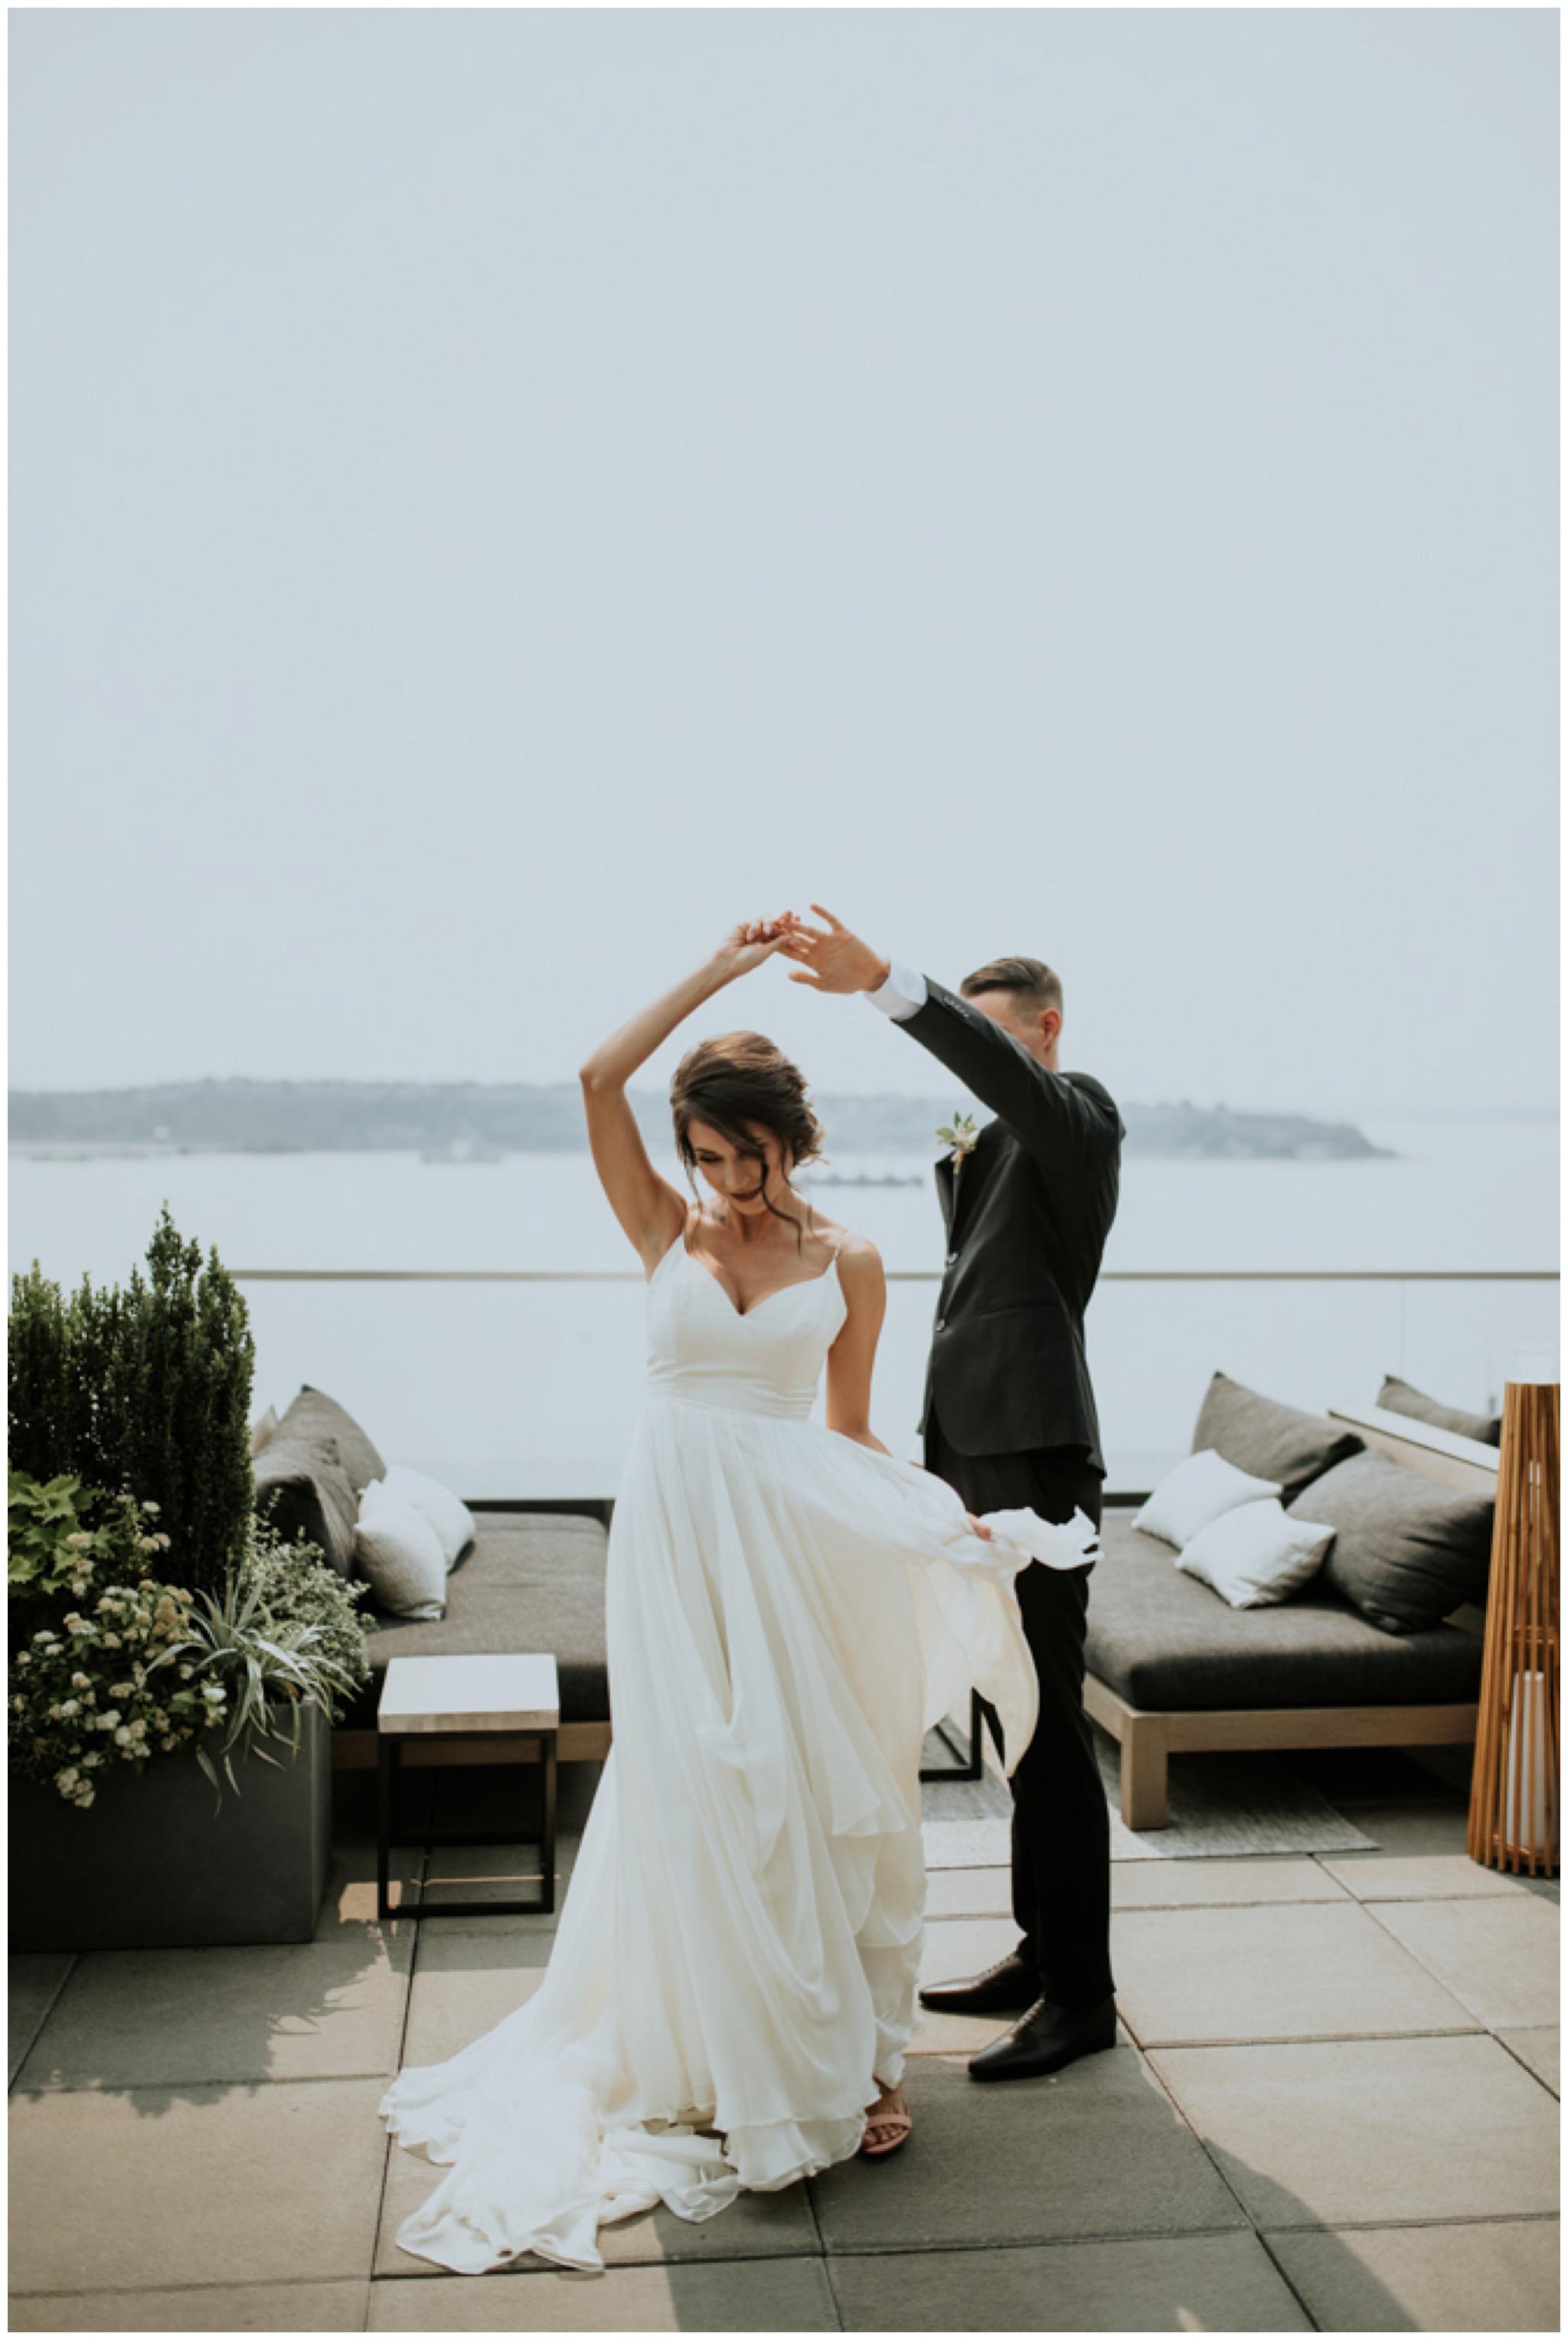 alyssa-keiran-westland-distillery-urban-seattle-wedding-photographer-caitlyn-nikula-54.jpg